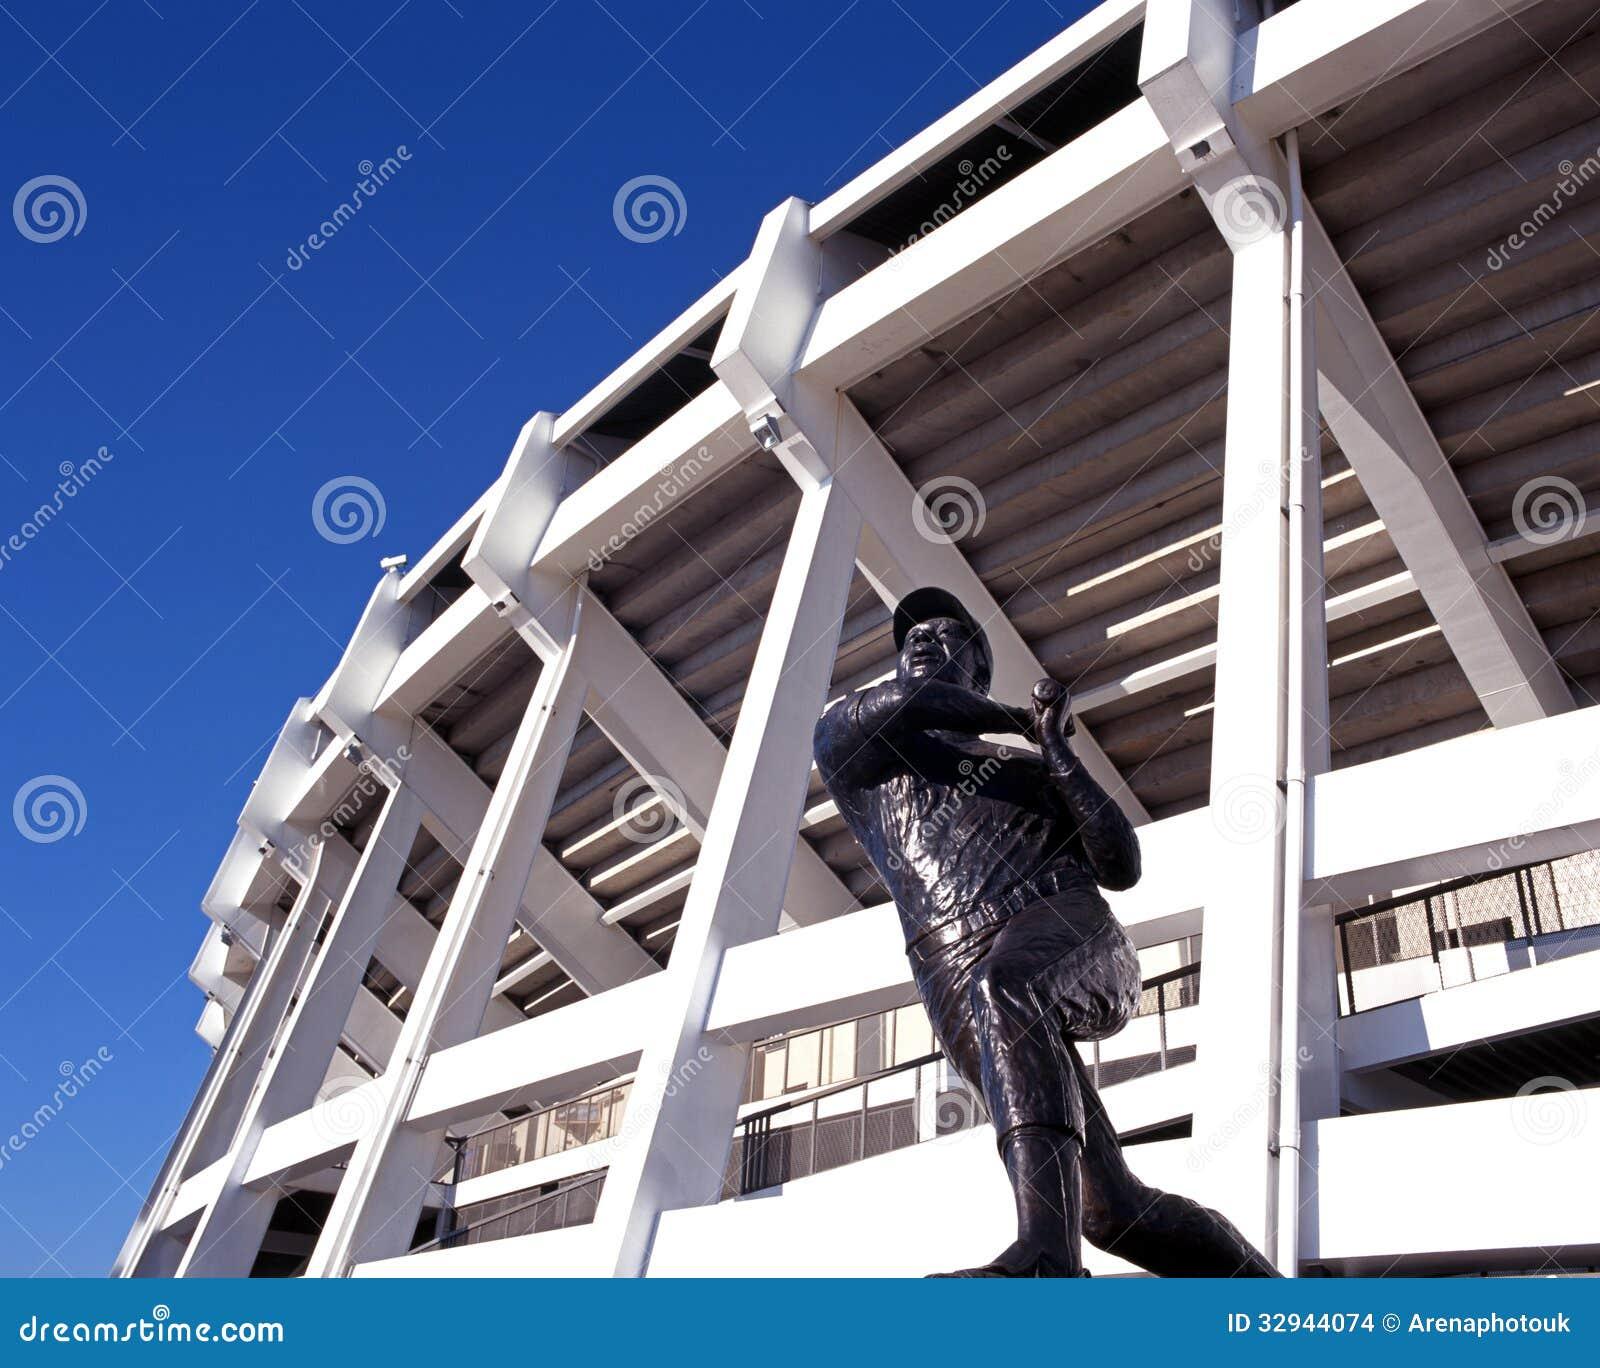 Statue de joueur de baseball, Atlanta, Etats-Unis.